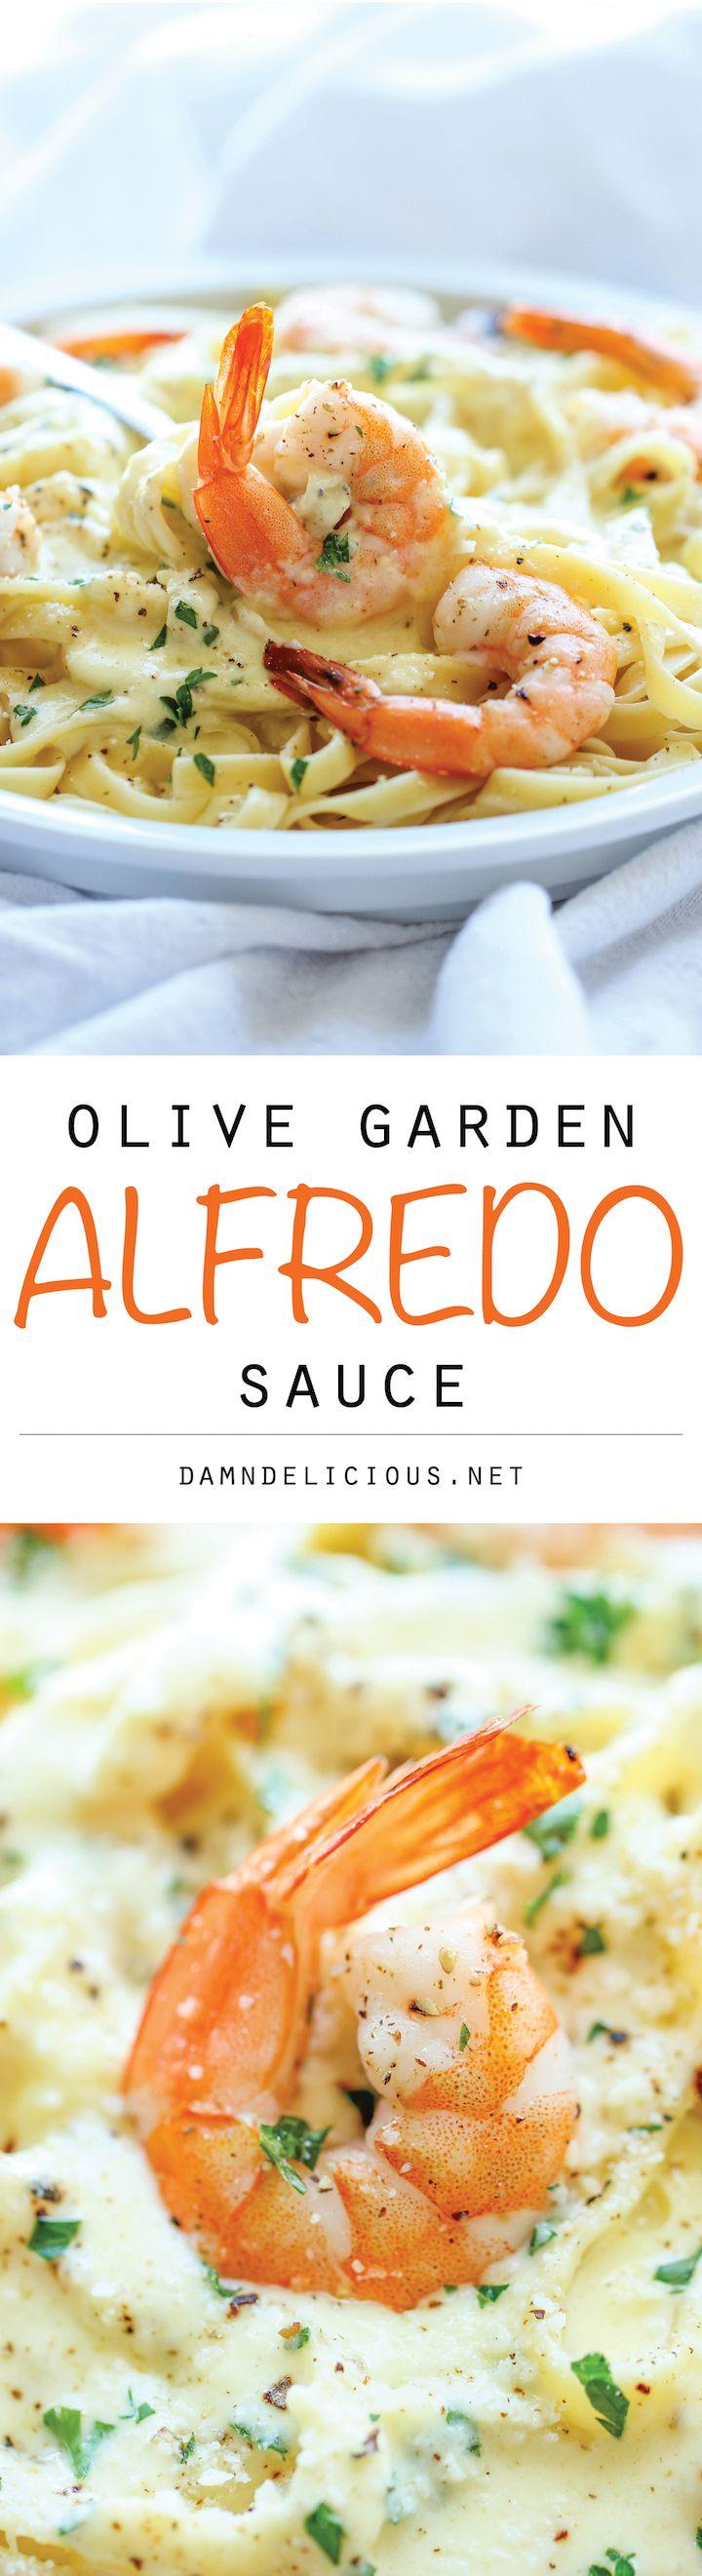 Park Art|My WordPress Blog_Olive Garden Fettuccine Alfredo Nutrition